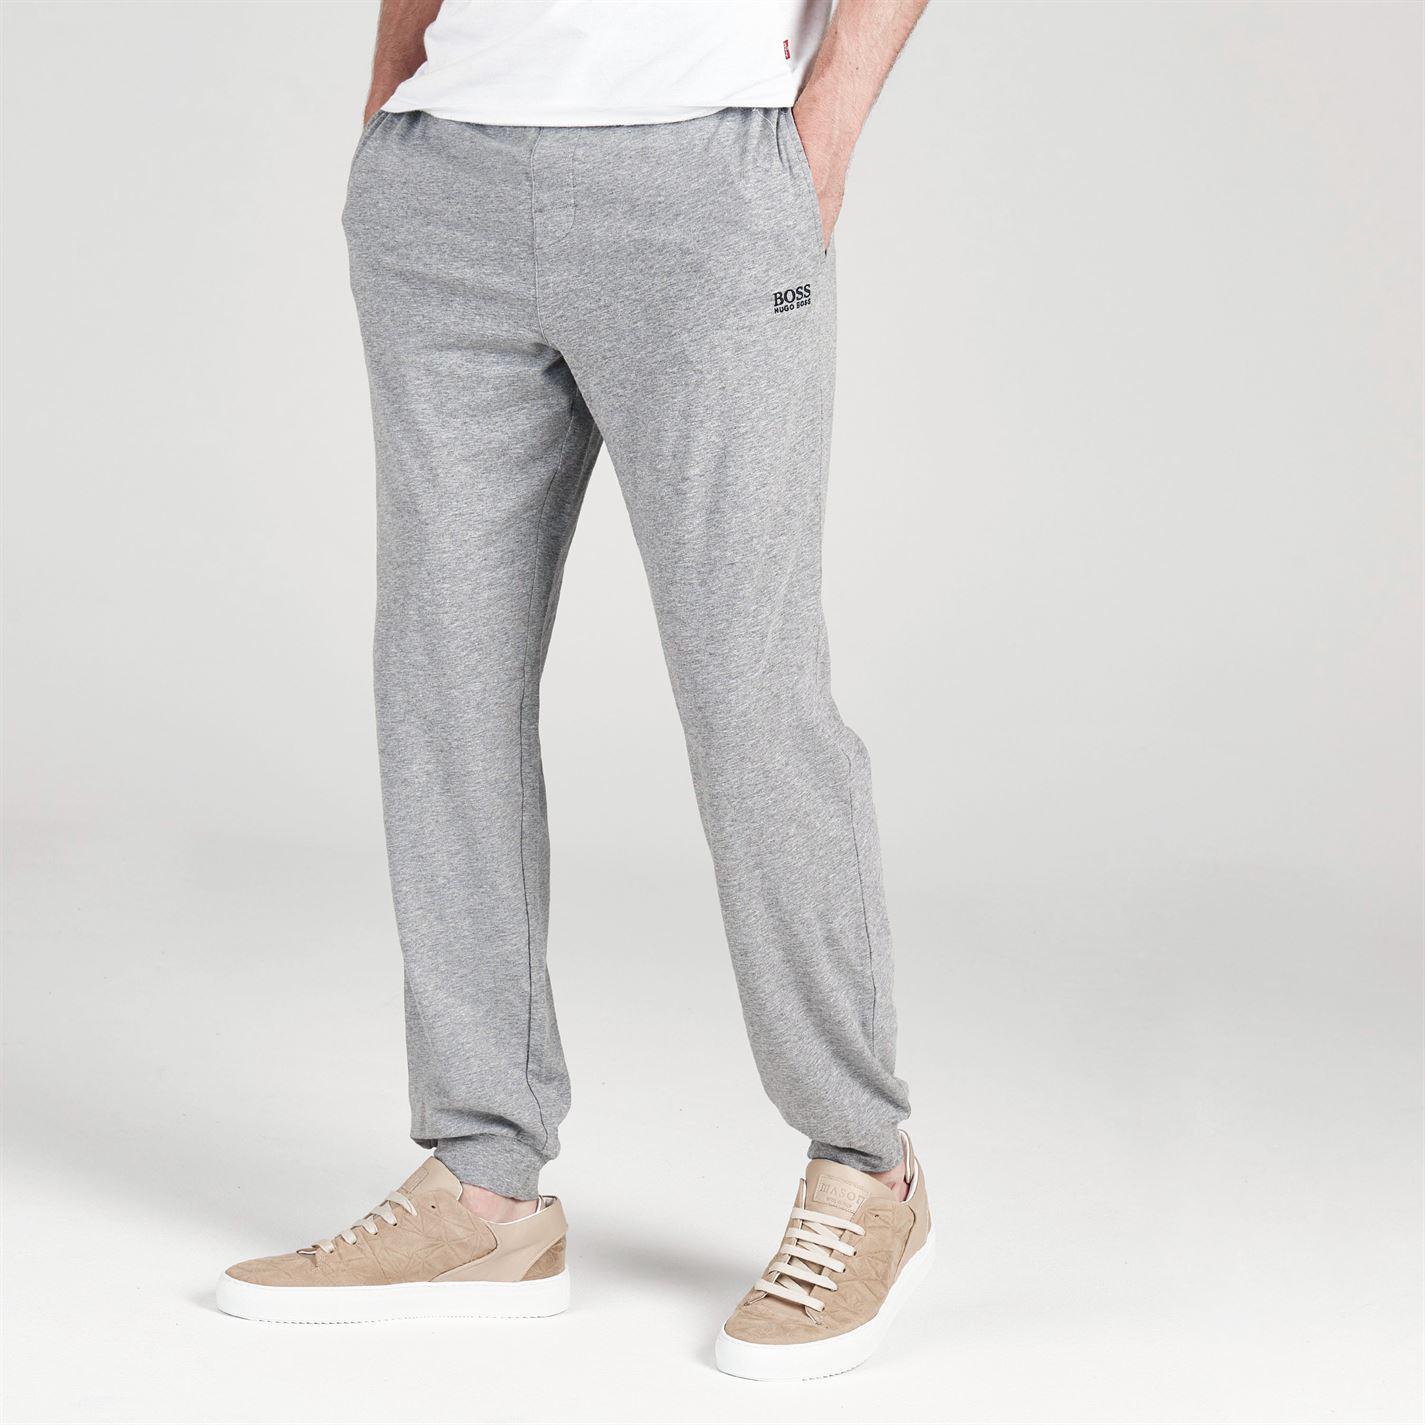 ef64495cf Lyst - BOSS by Hugo Boss Cuffed Jogging Bottoms in Gray for Men